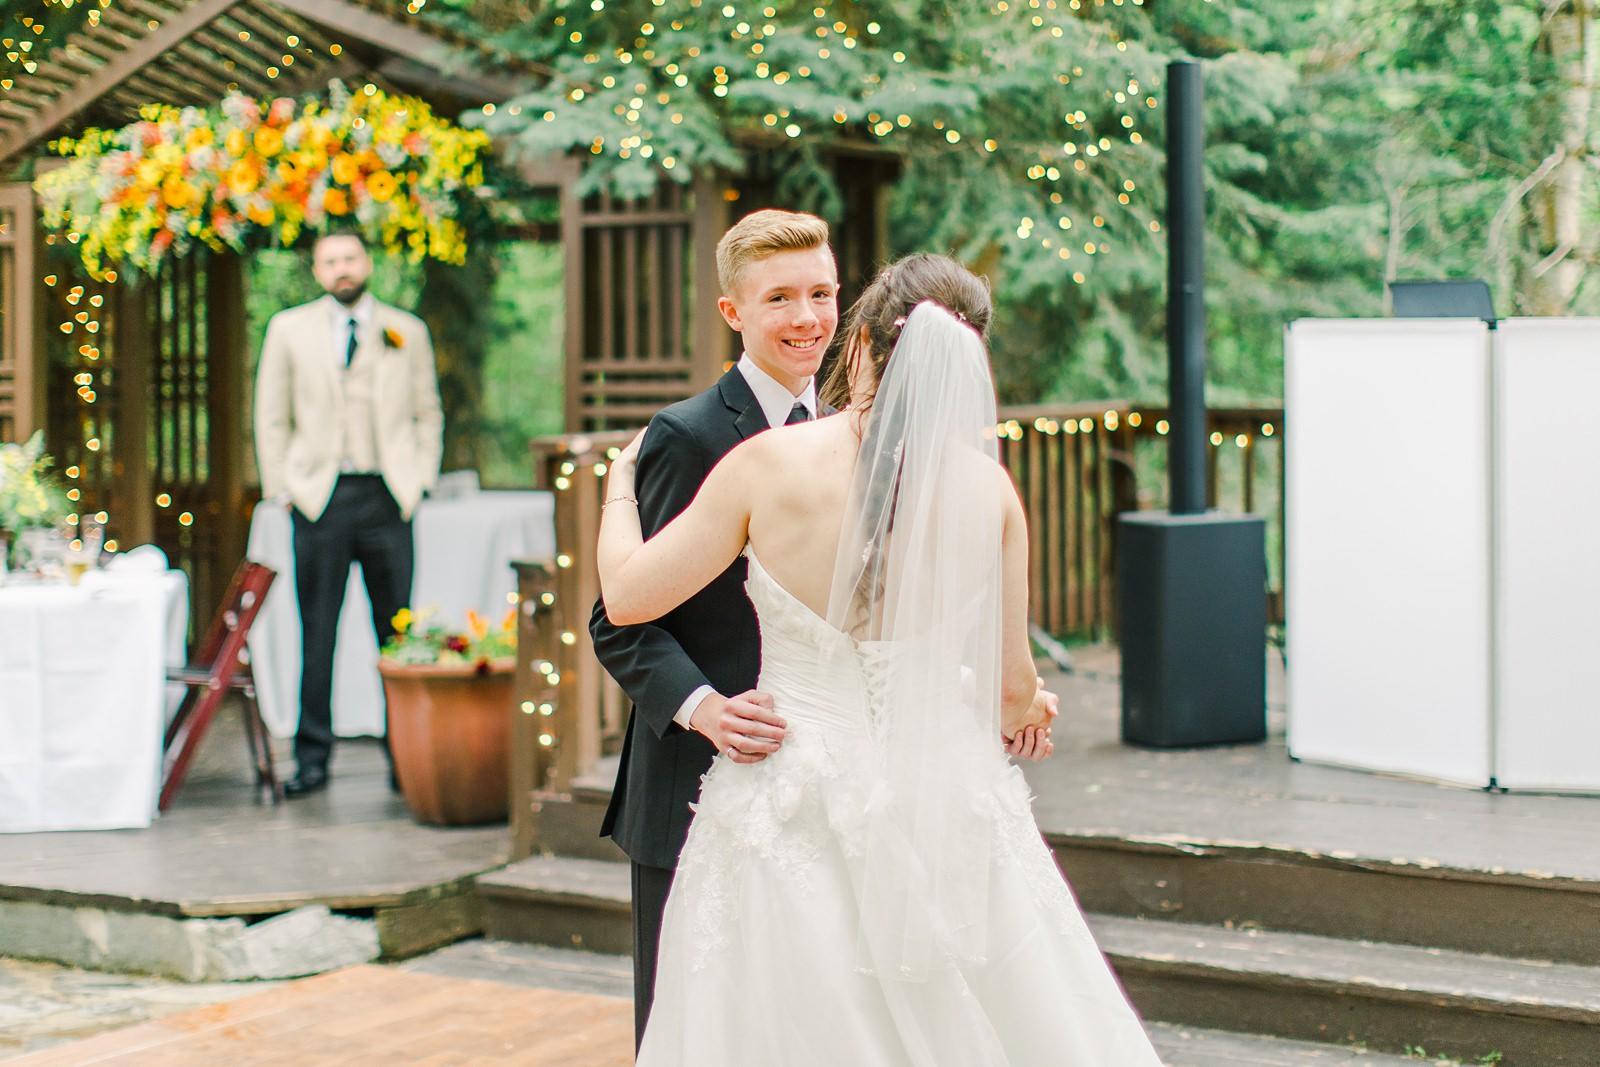 Millcreek Inn Summer Wedding, Utah wedding photography Millcreek Canyon, Salt Lake City, mother son dance